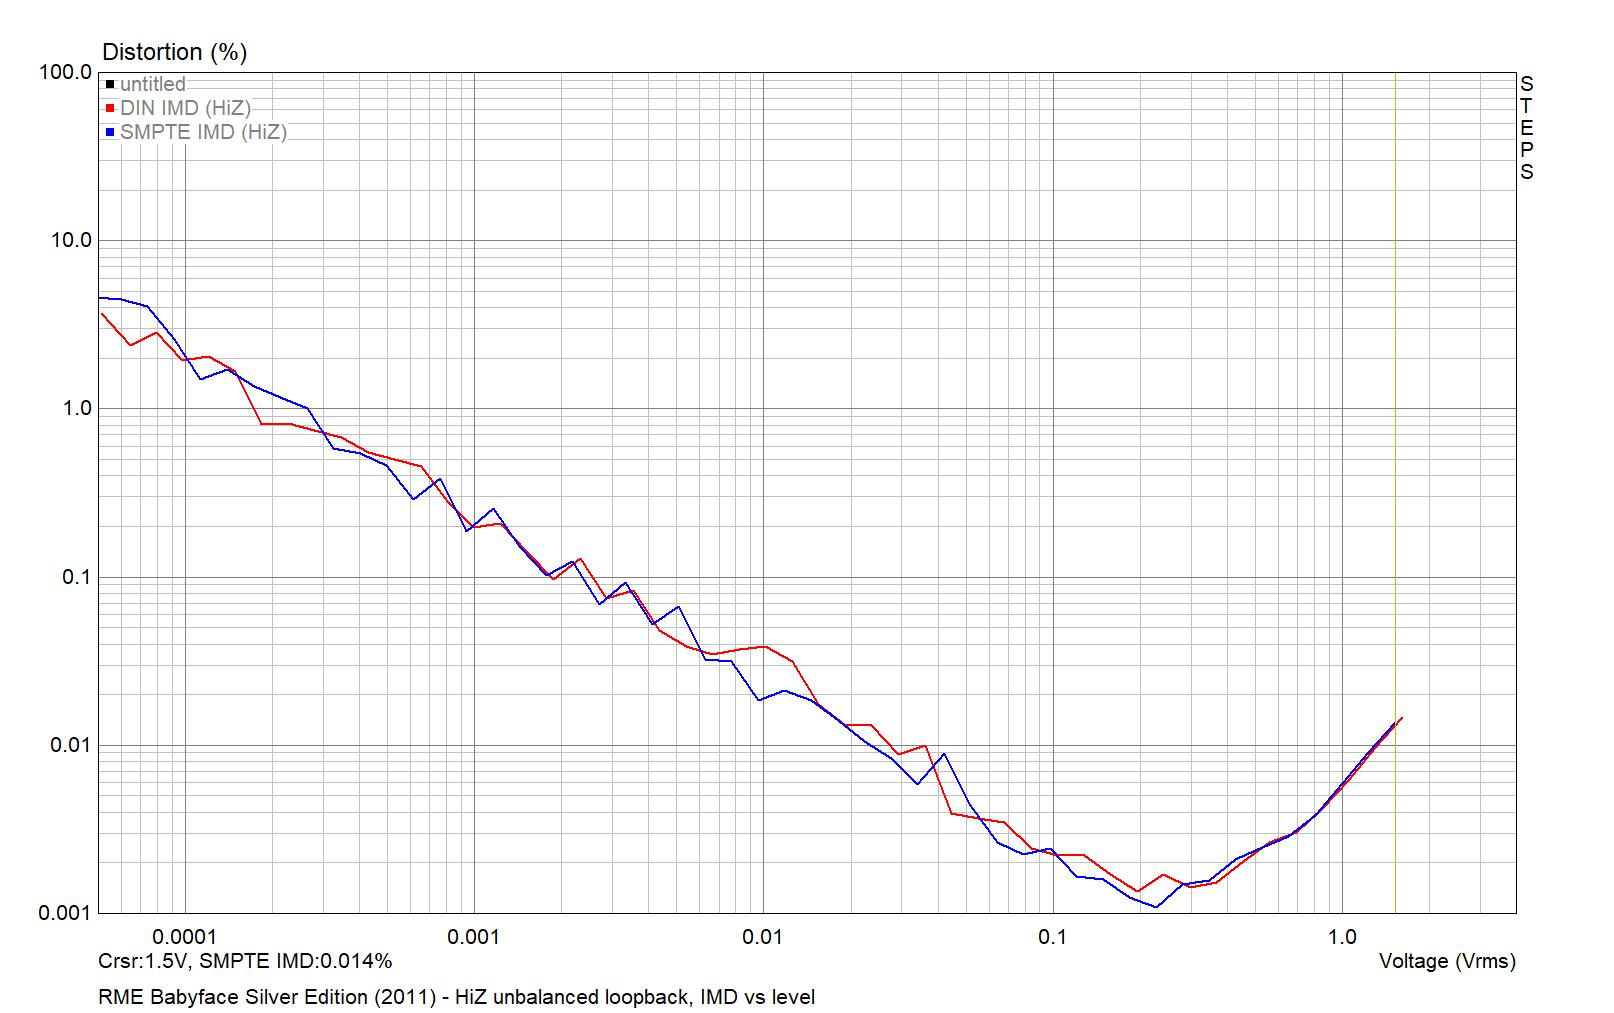 RME Babyface Silver Edition 2011 - HiZ unbalanced IMD vs level 2021-04-01.png